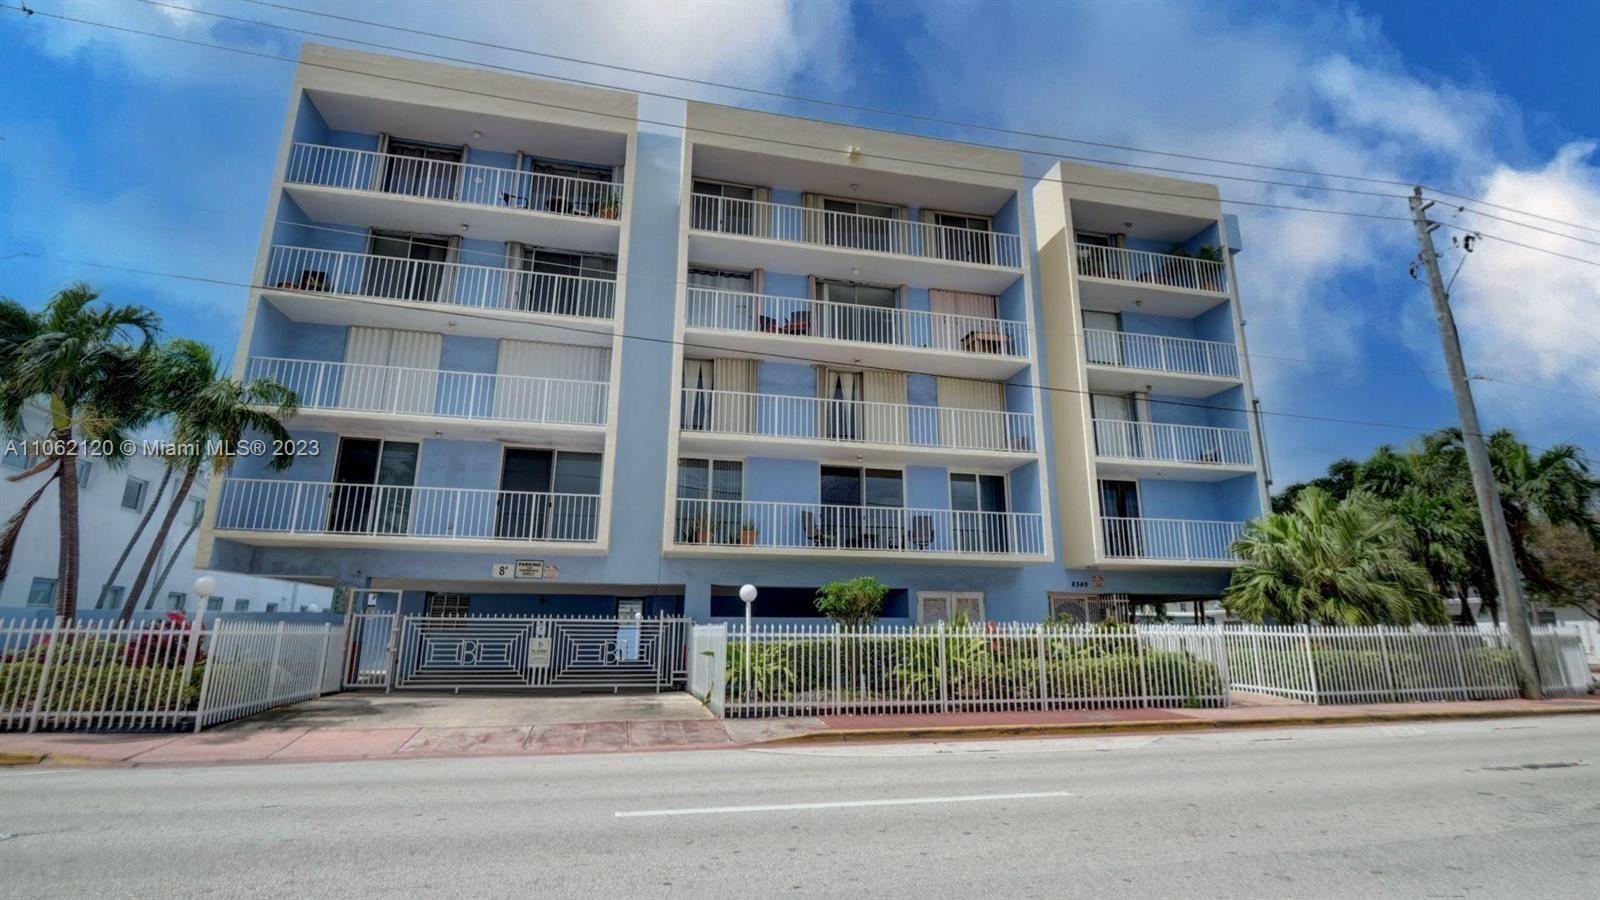 8340 Harding Ave #401, Miami Beach, FL 33141 - #: A11062120